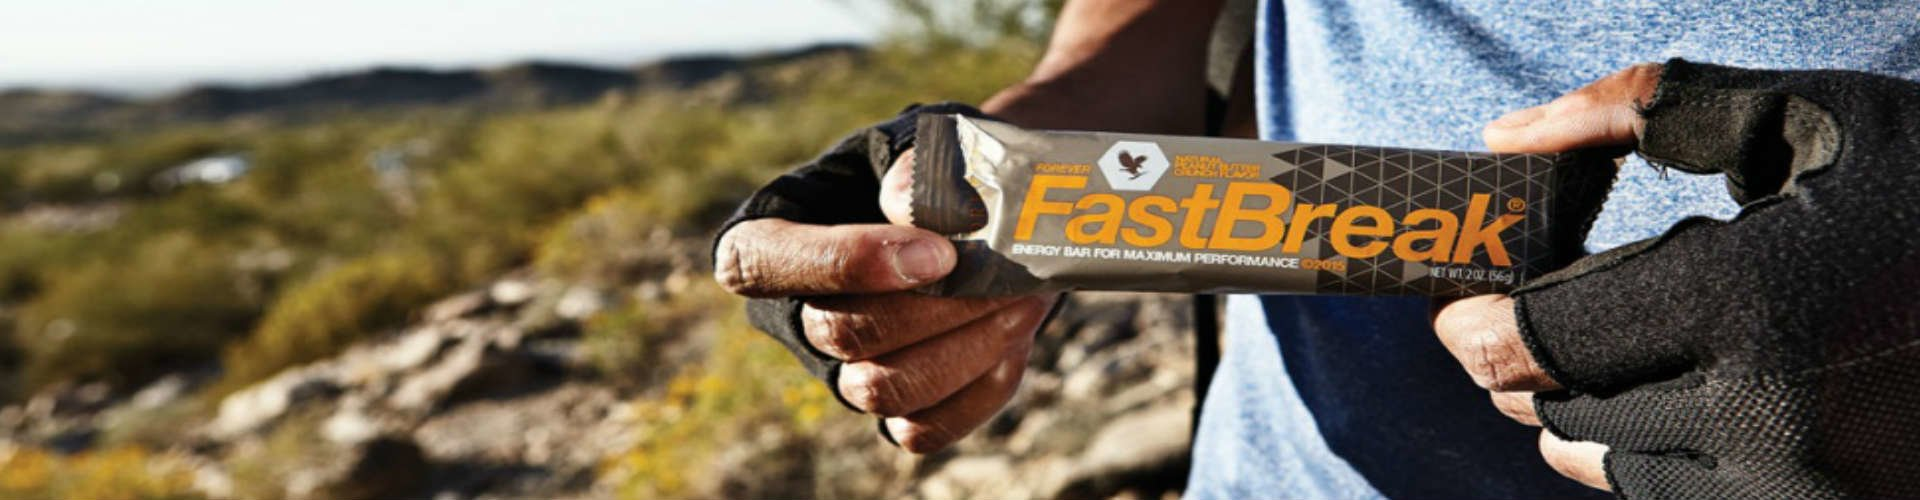 Diät- Energieriegel, Forever Fastbreak 520